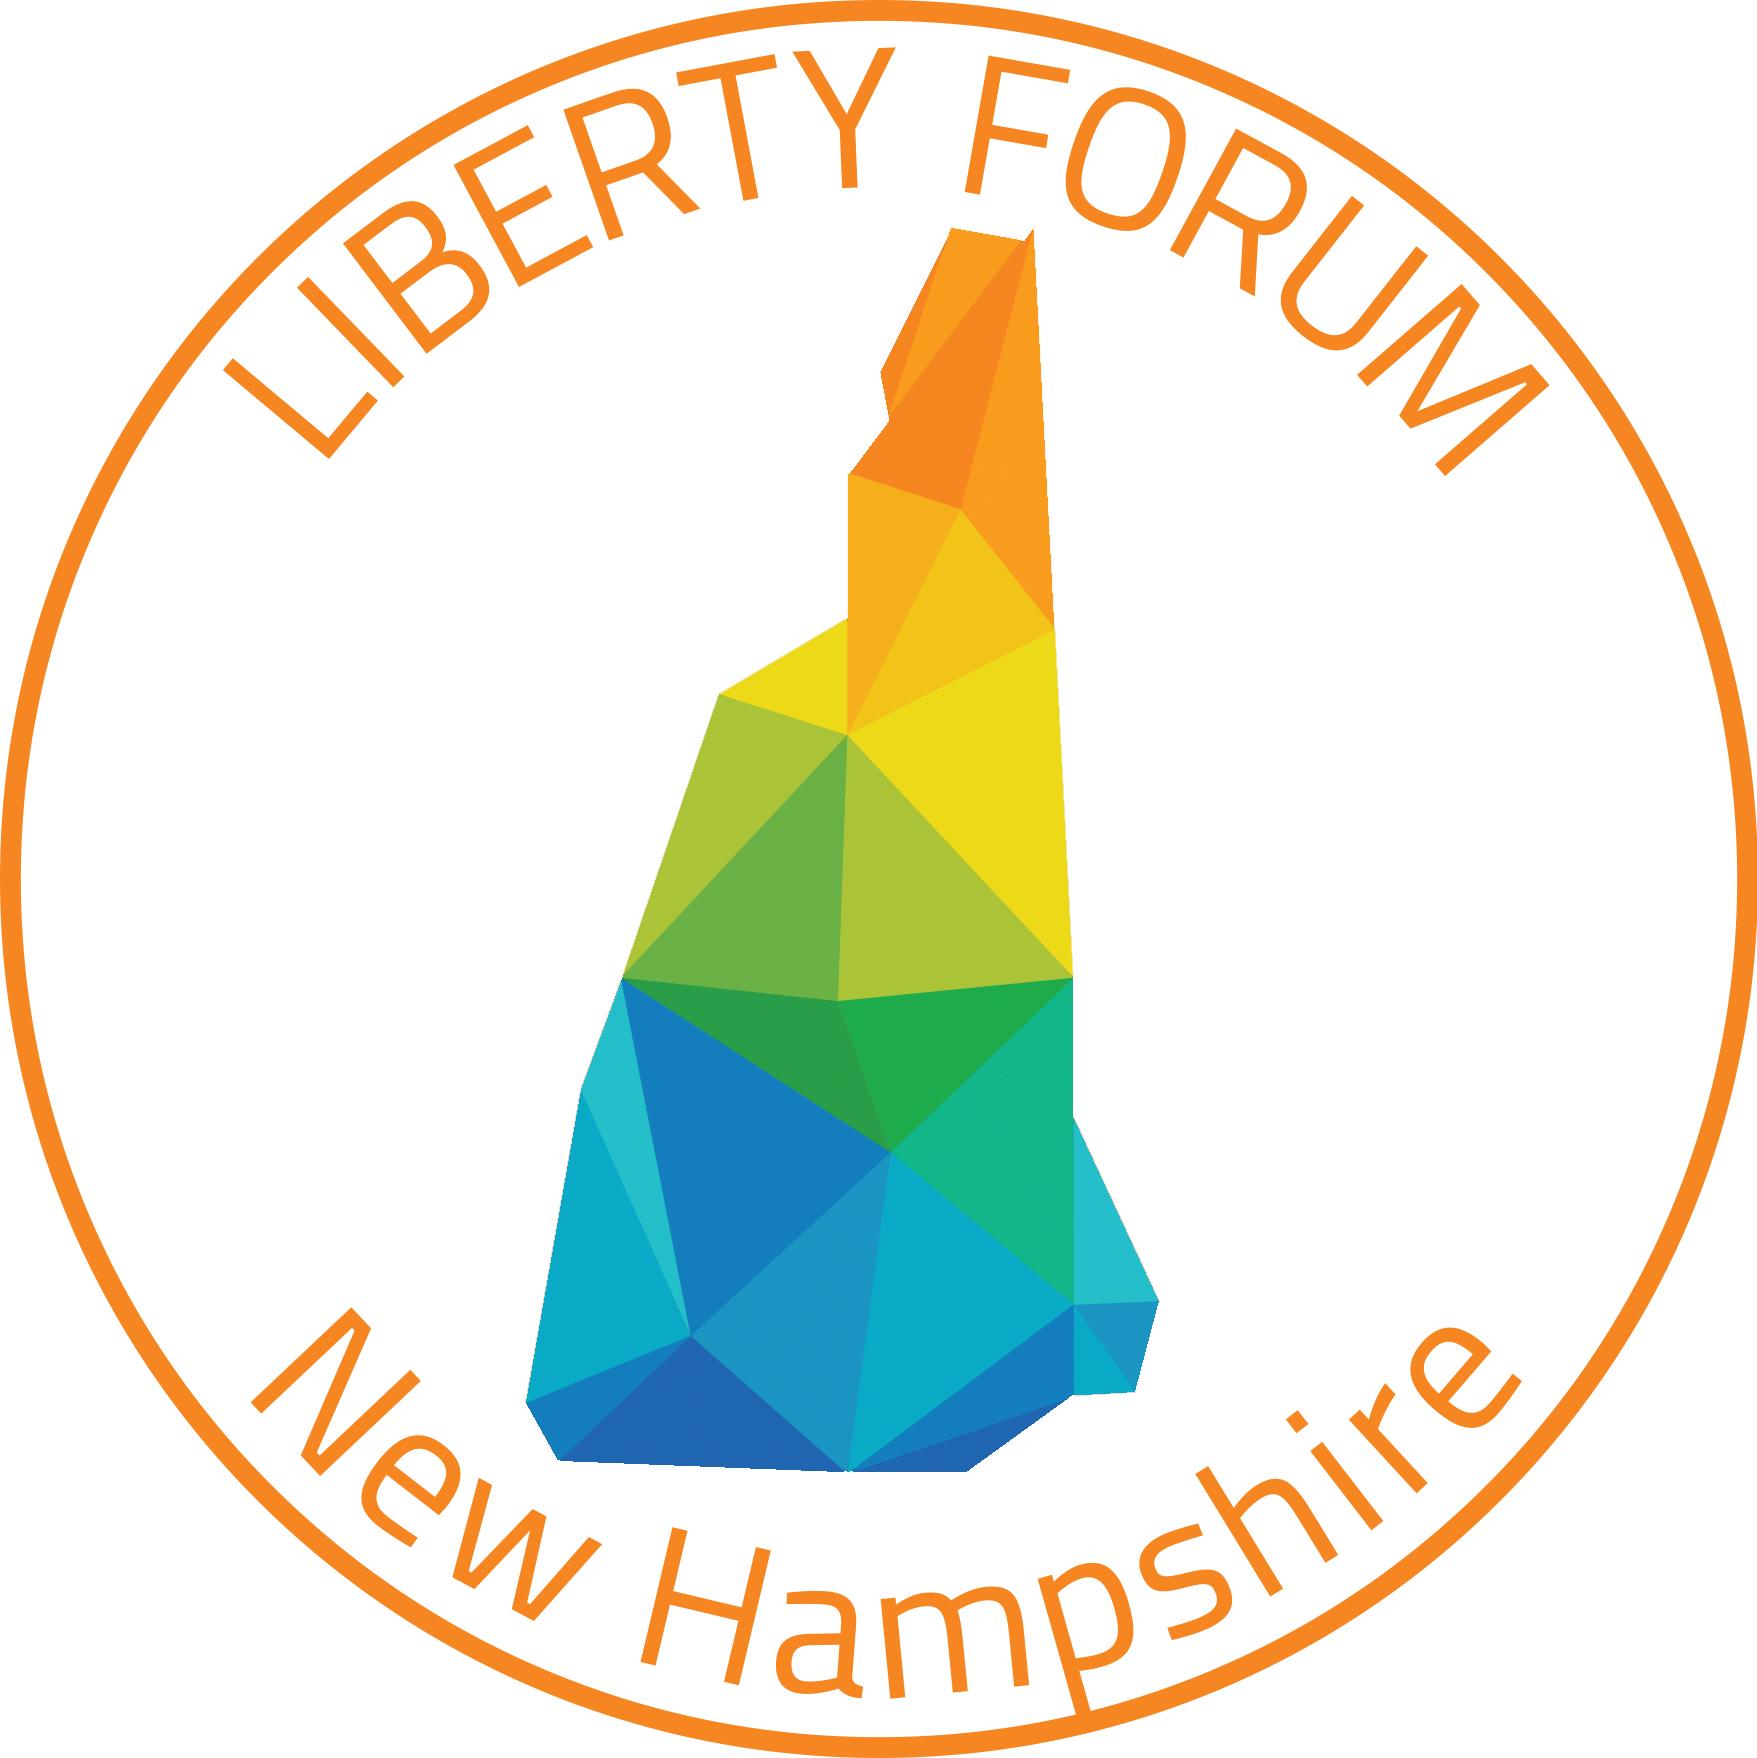 Liberty Forum 2018